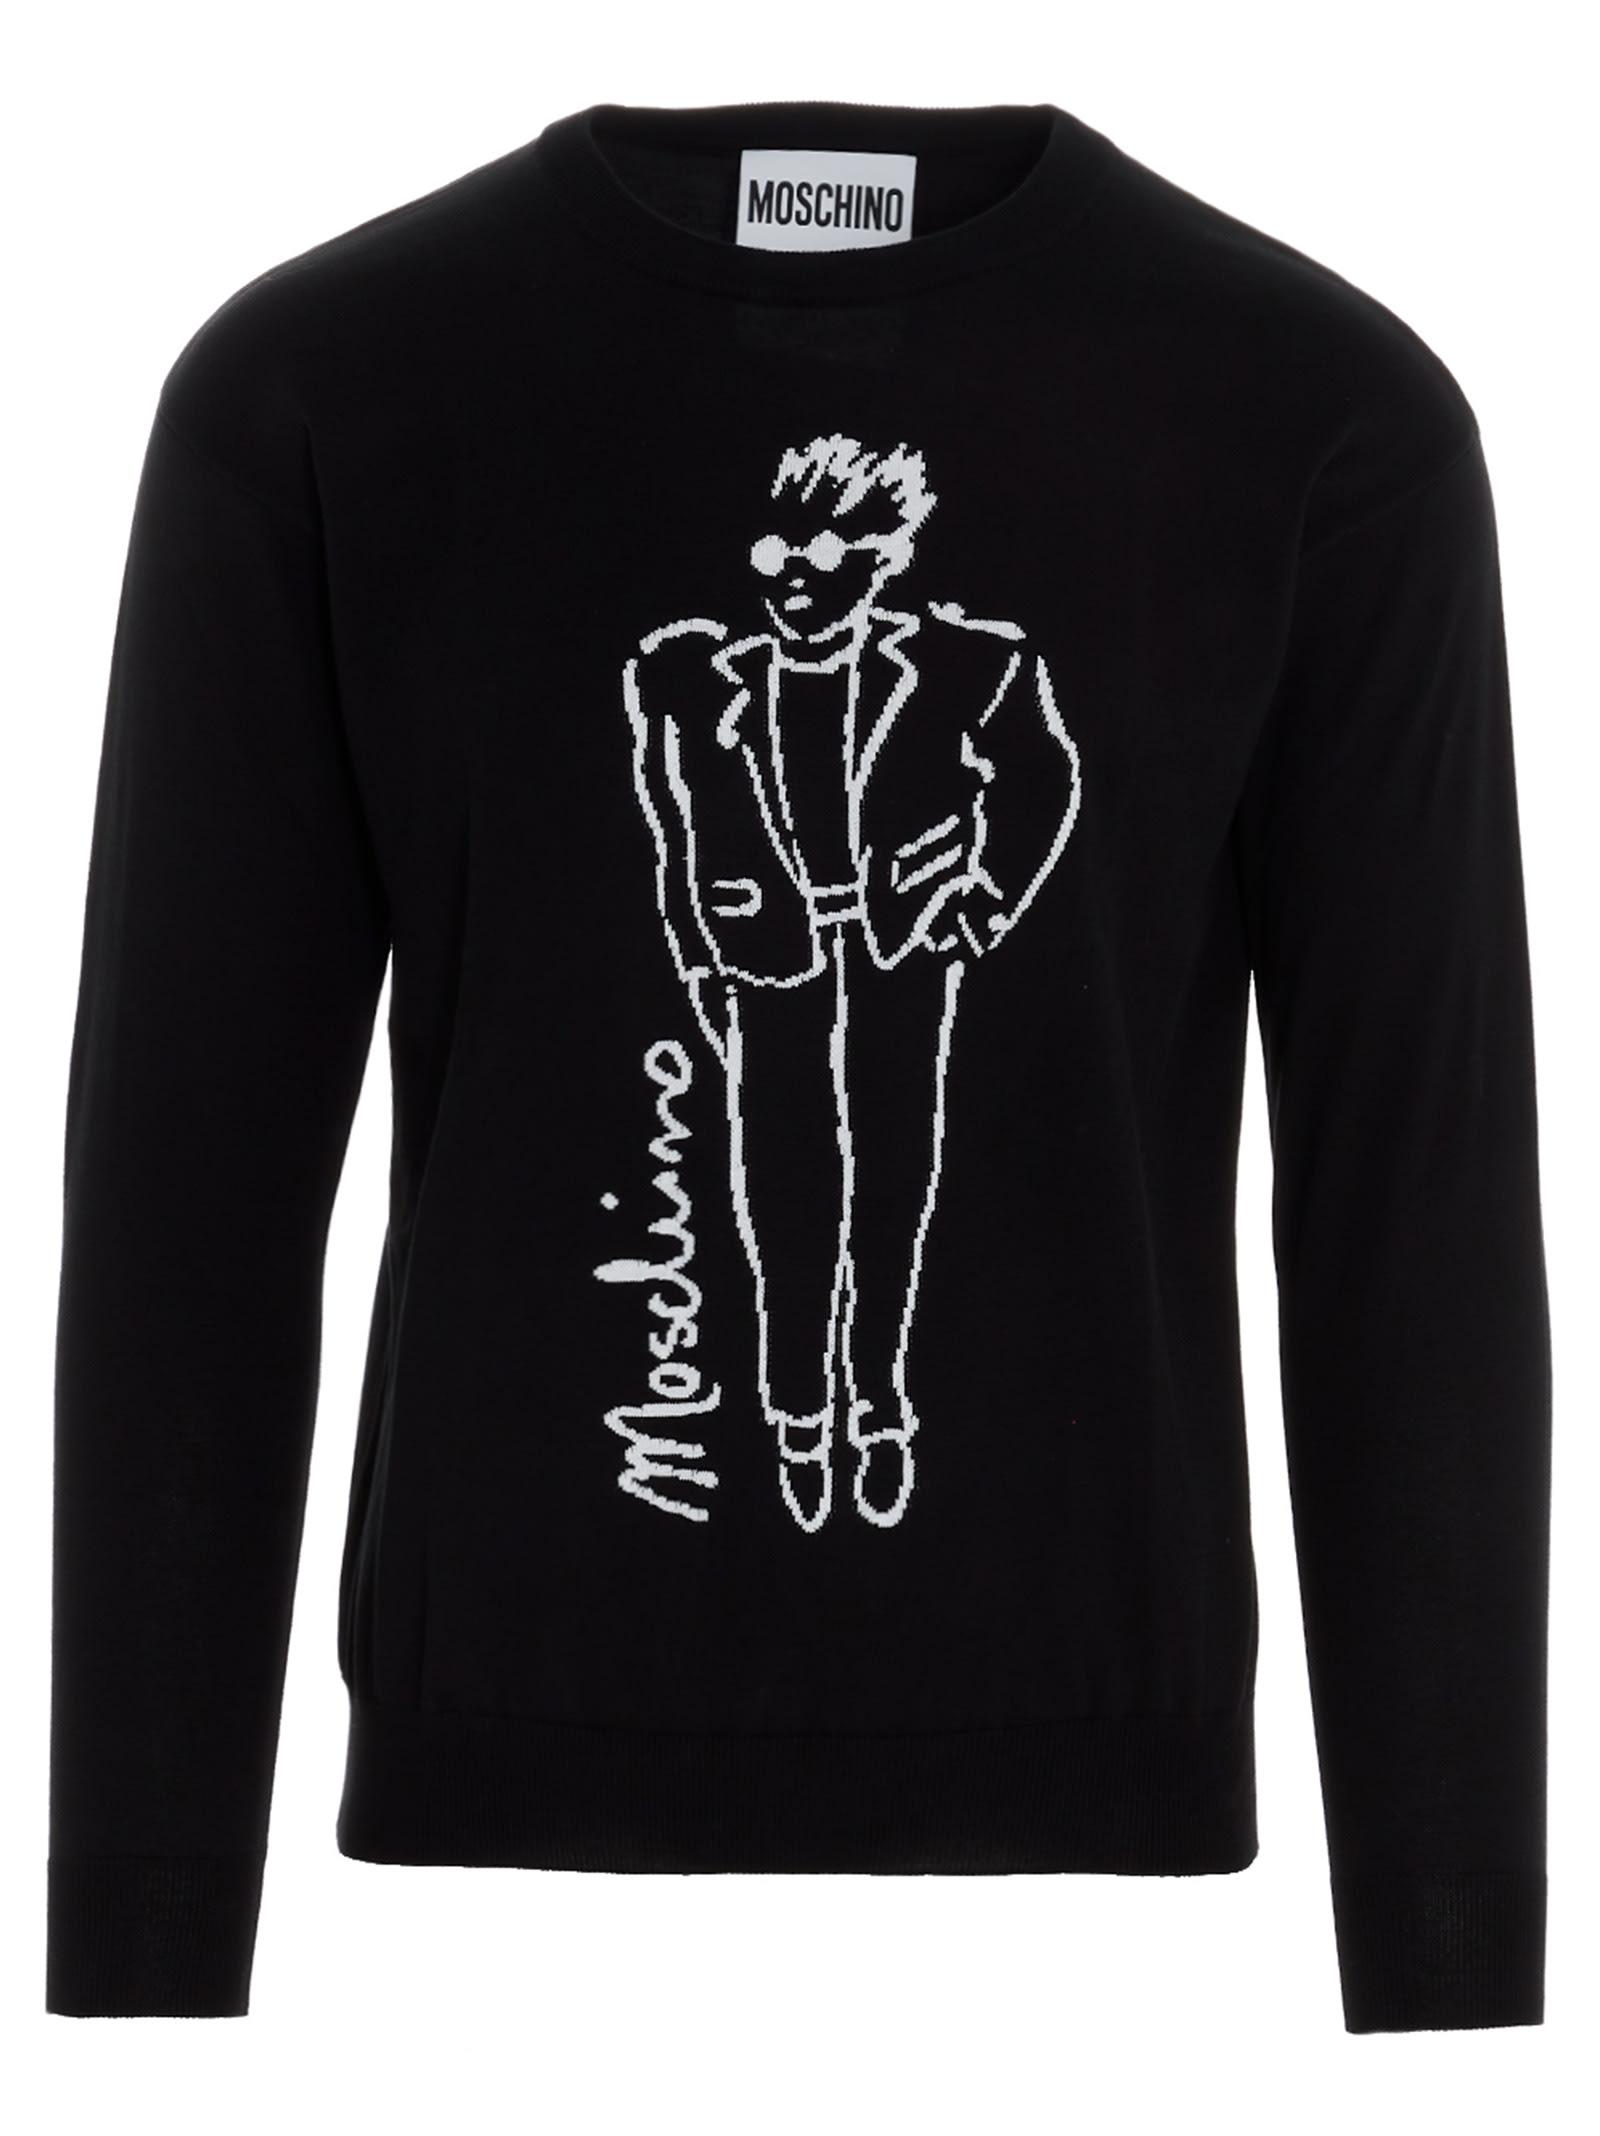 Moschino charactere Sweater